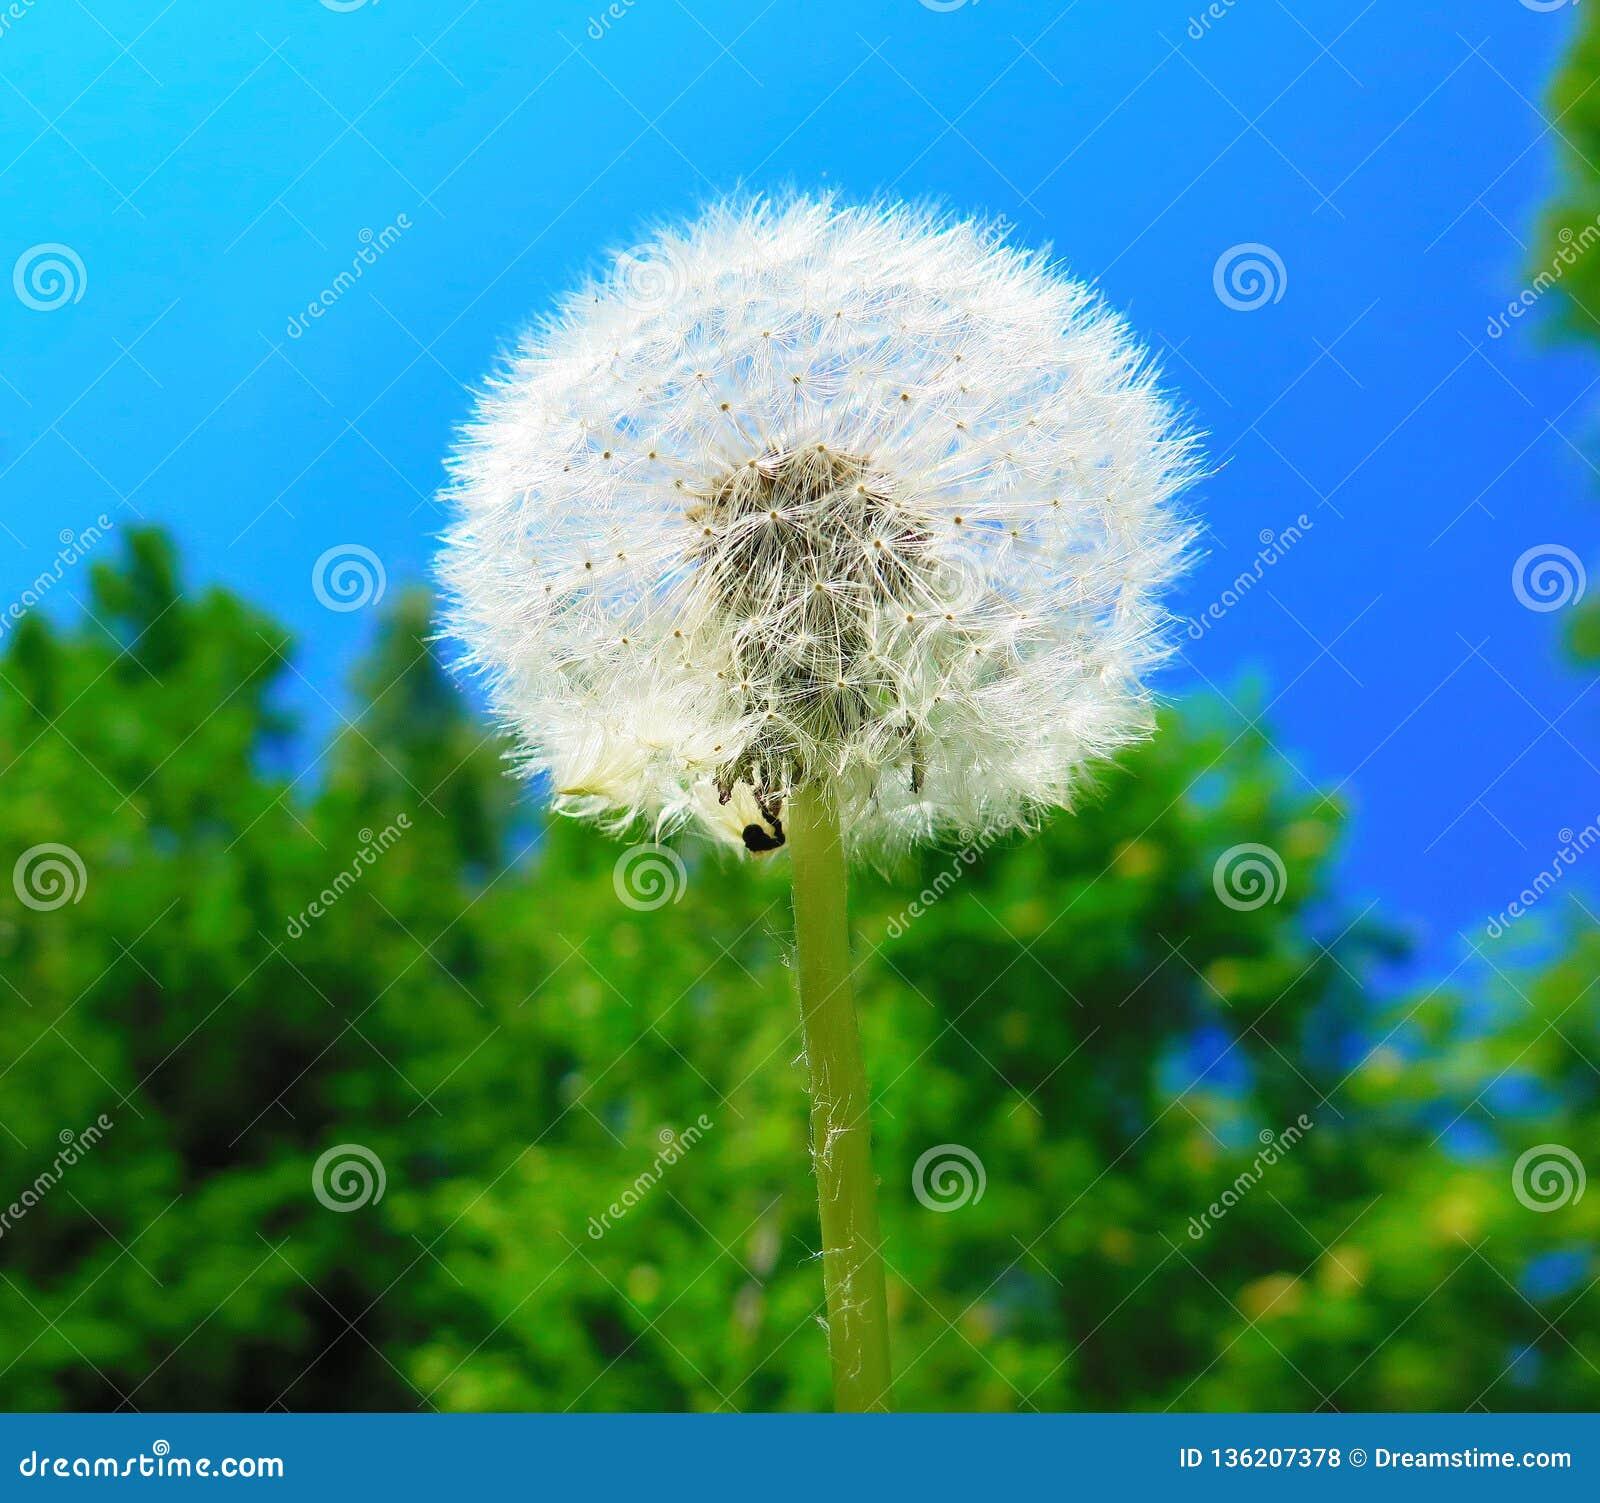 Summer flower air dandelion, fluffy ball.